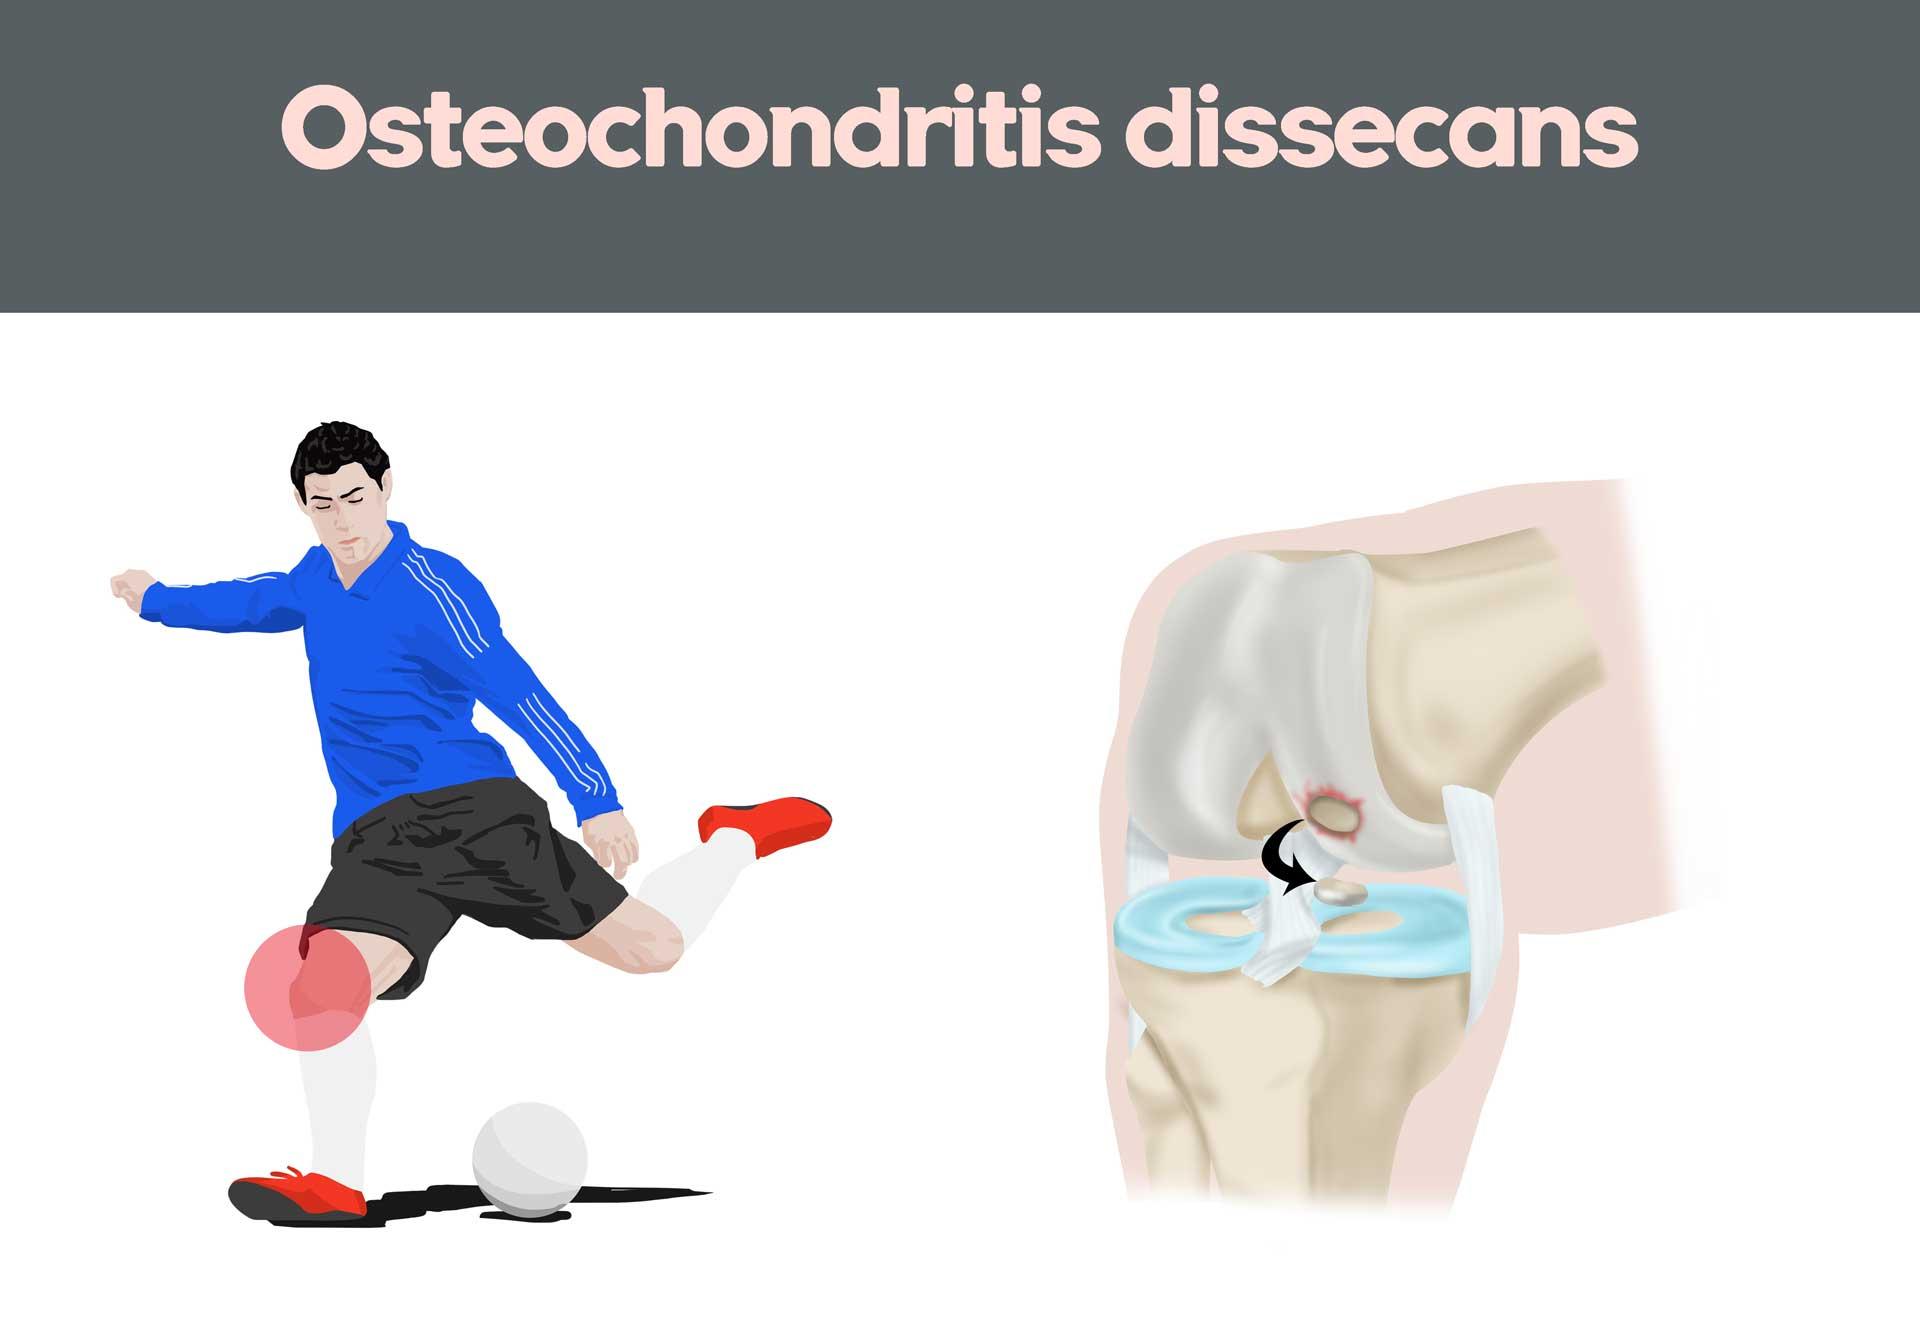 Osteochondritis Dissecans (OCD) Joint Surface Problems